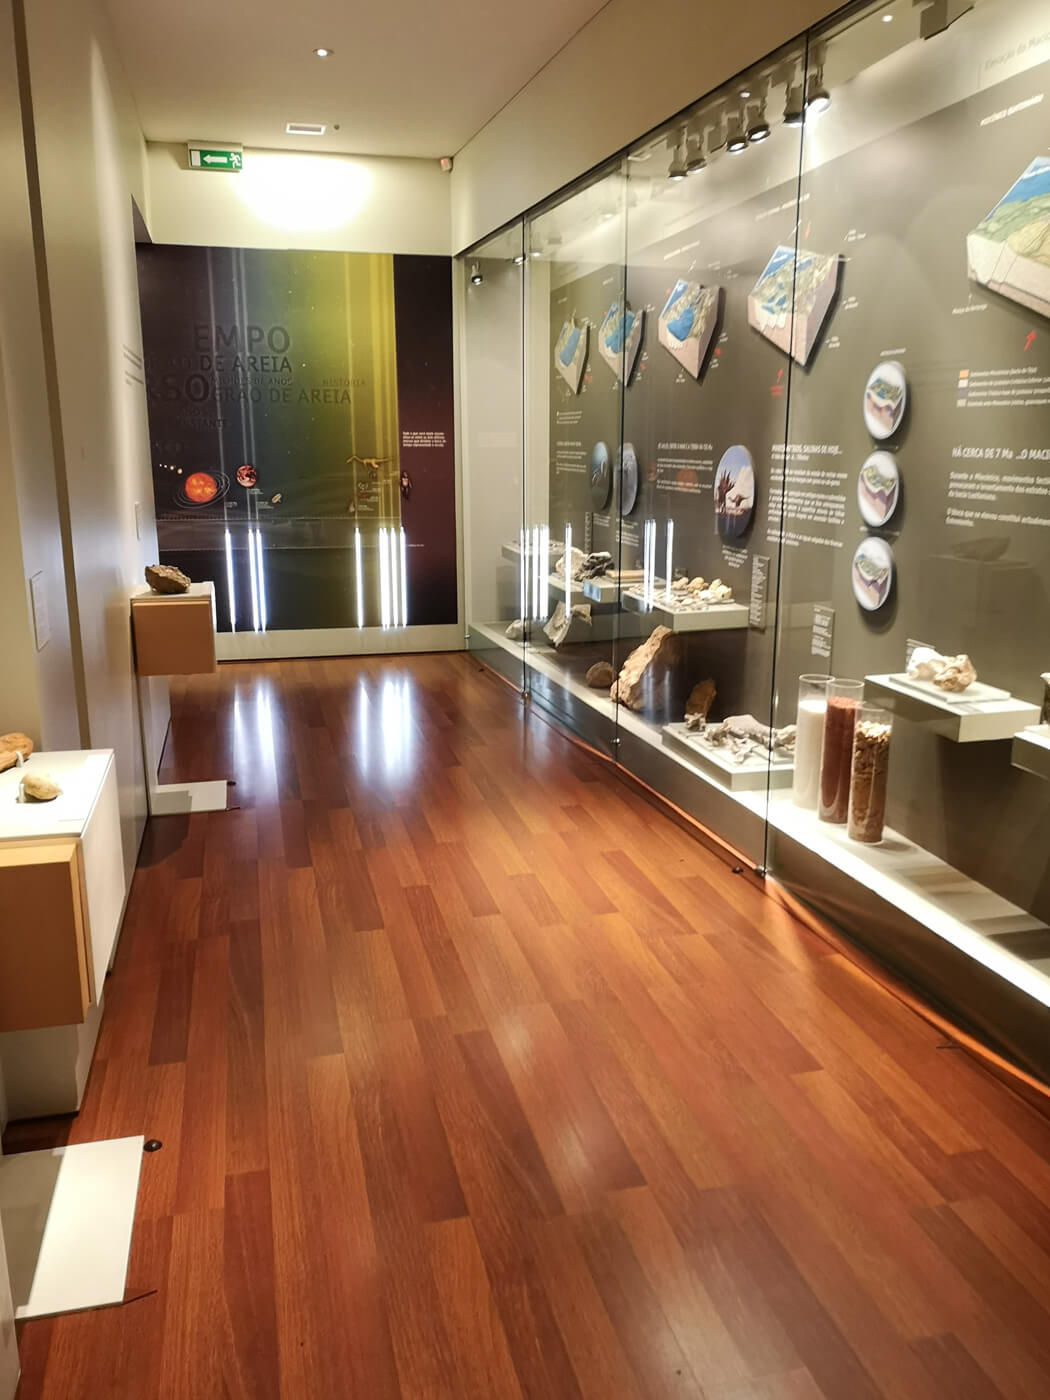 Batalha Conselhia Community Museum